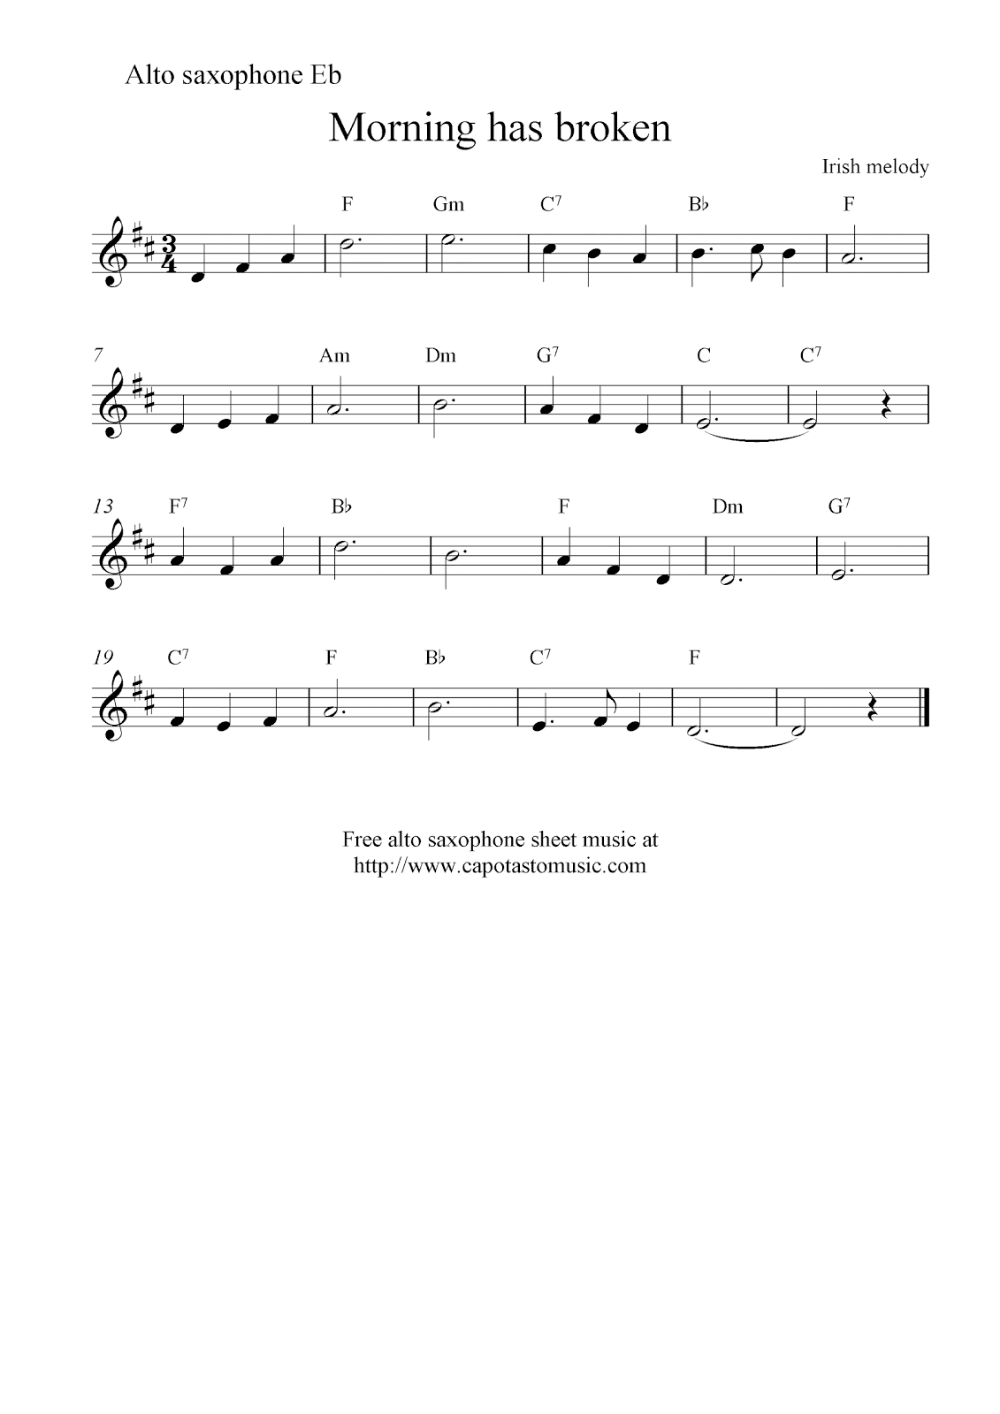 Alto Saxophone Sheet Music Notes